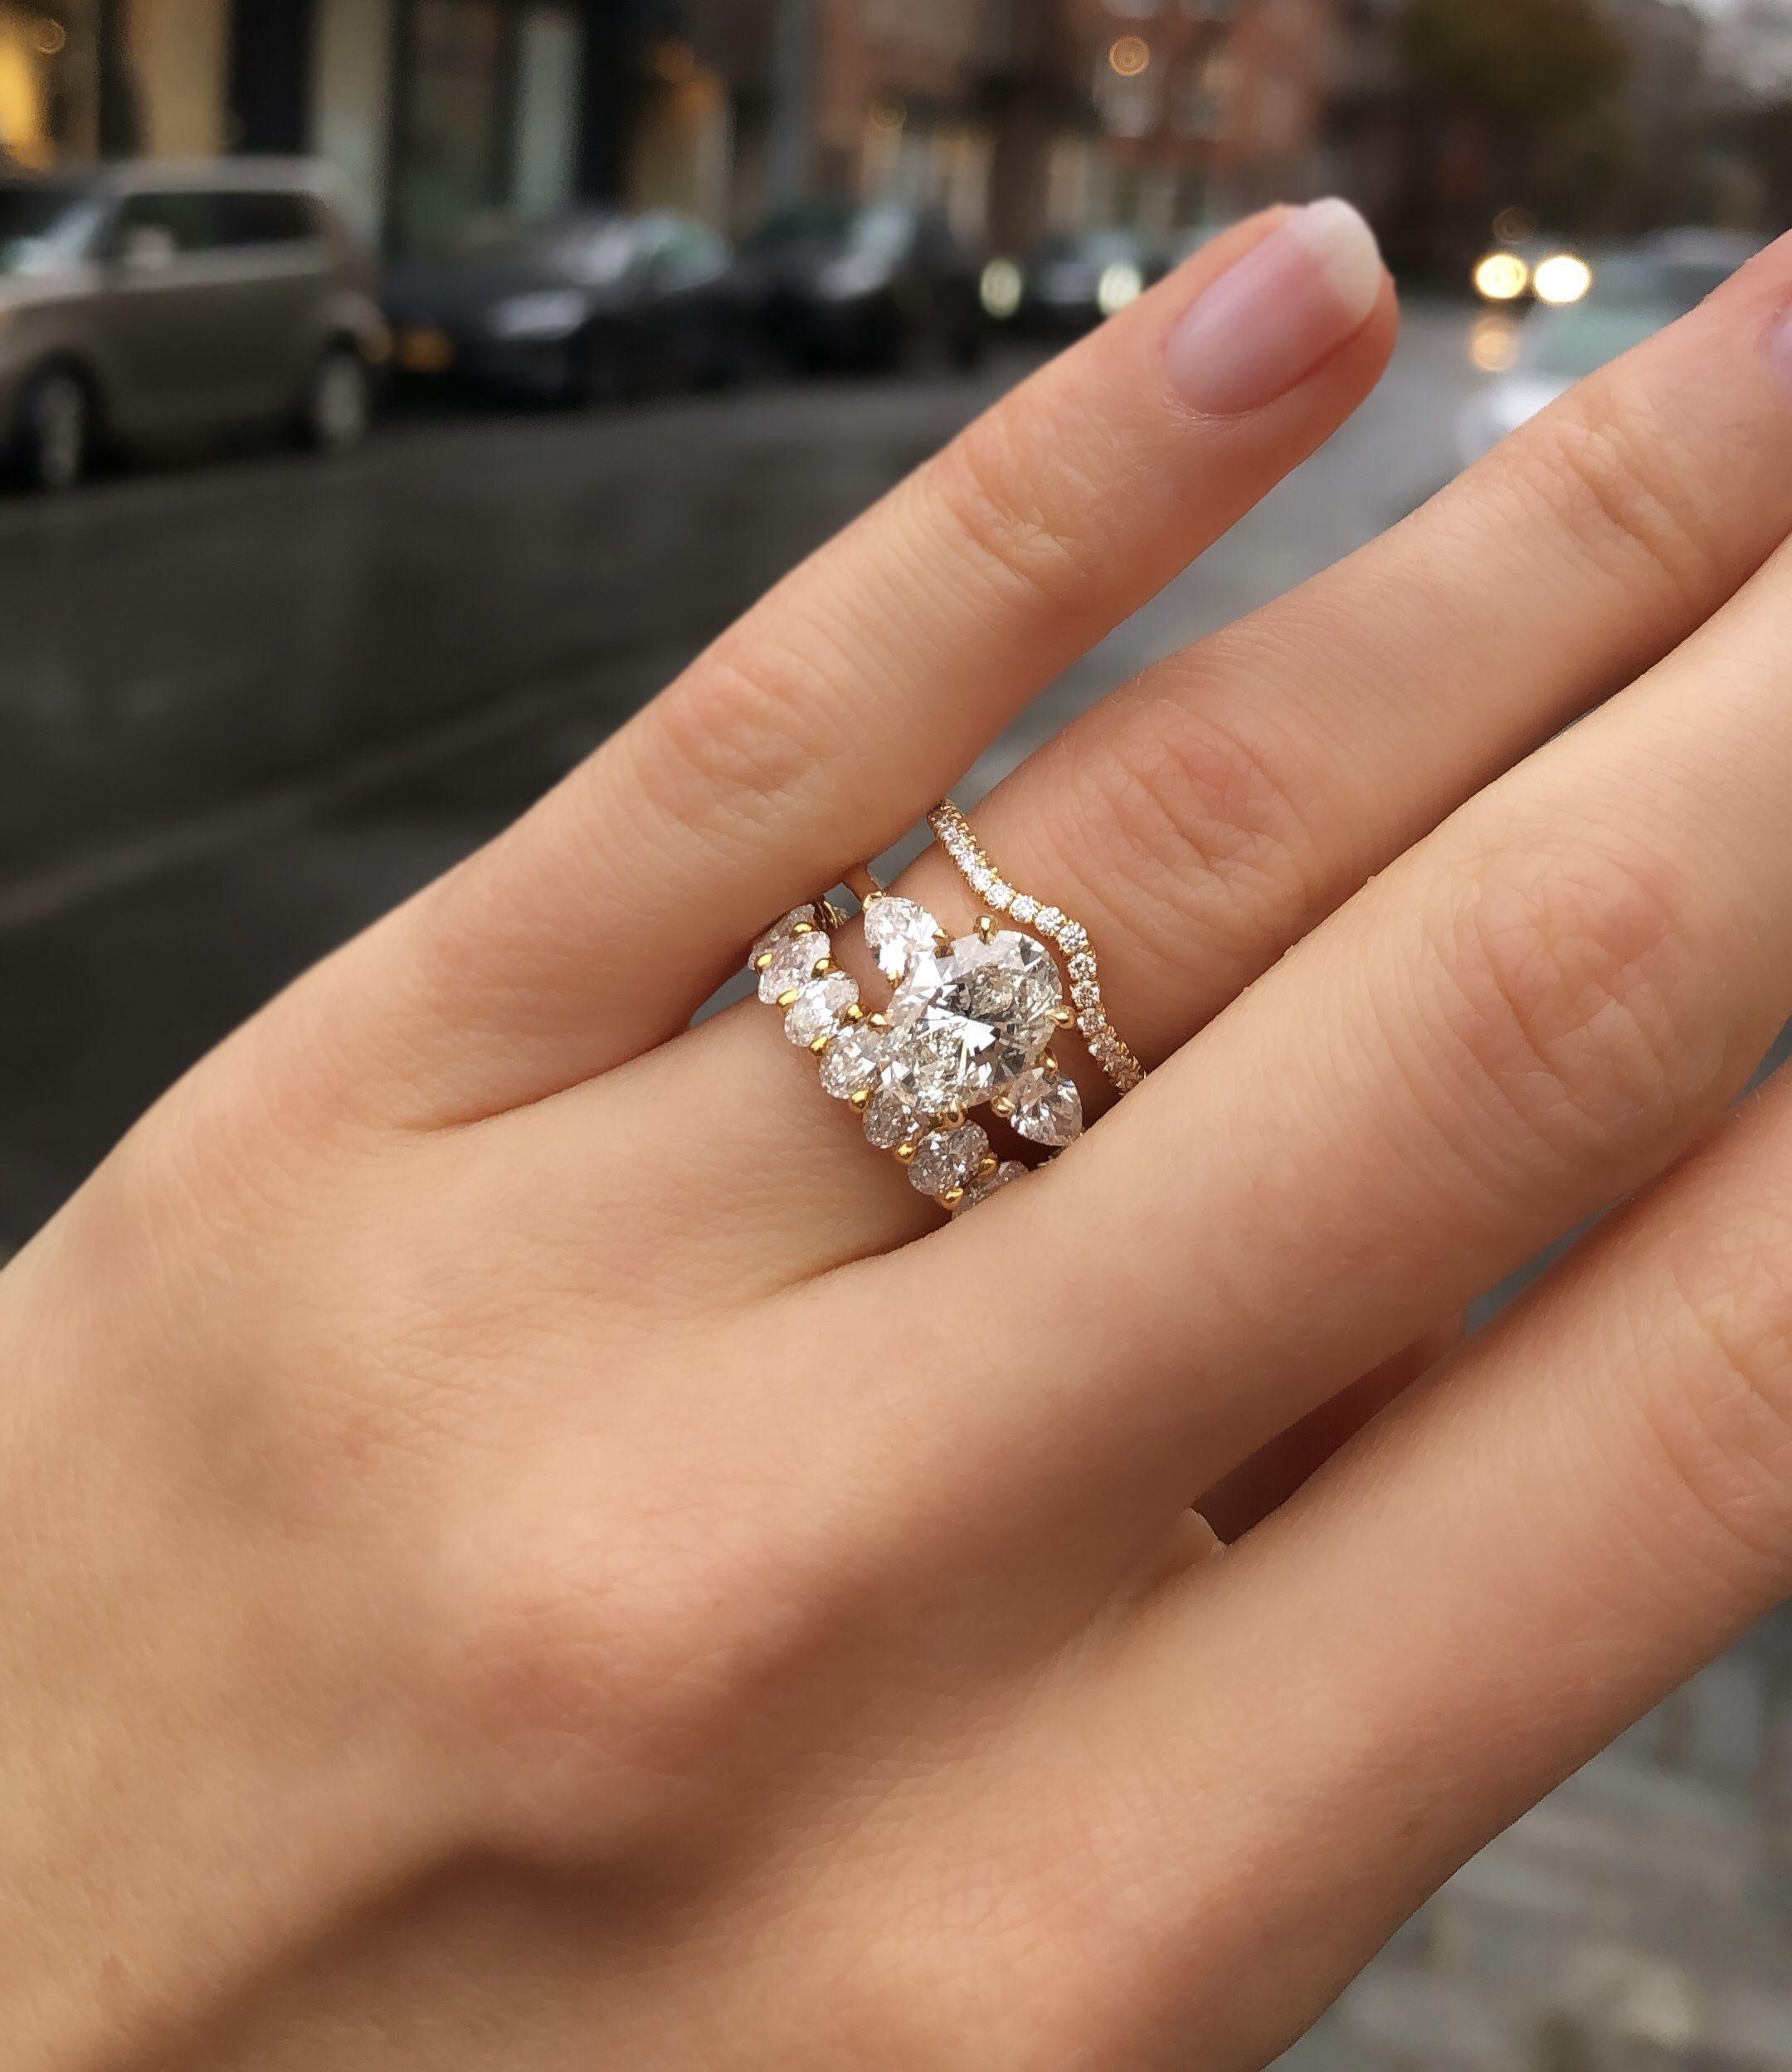 2 Ct Oval Cut Diamond Three Stone Engagement Wedding Ring 14k Yellow Gold Over